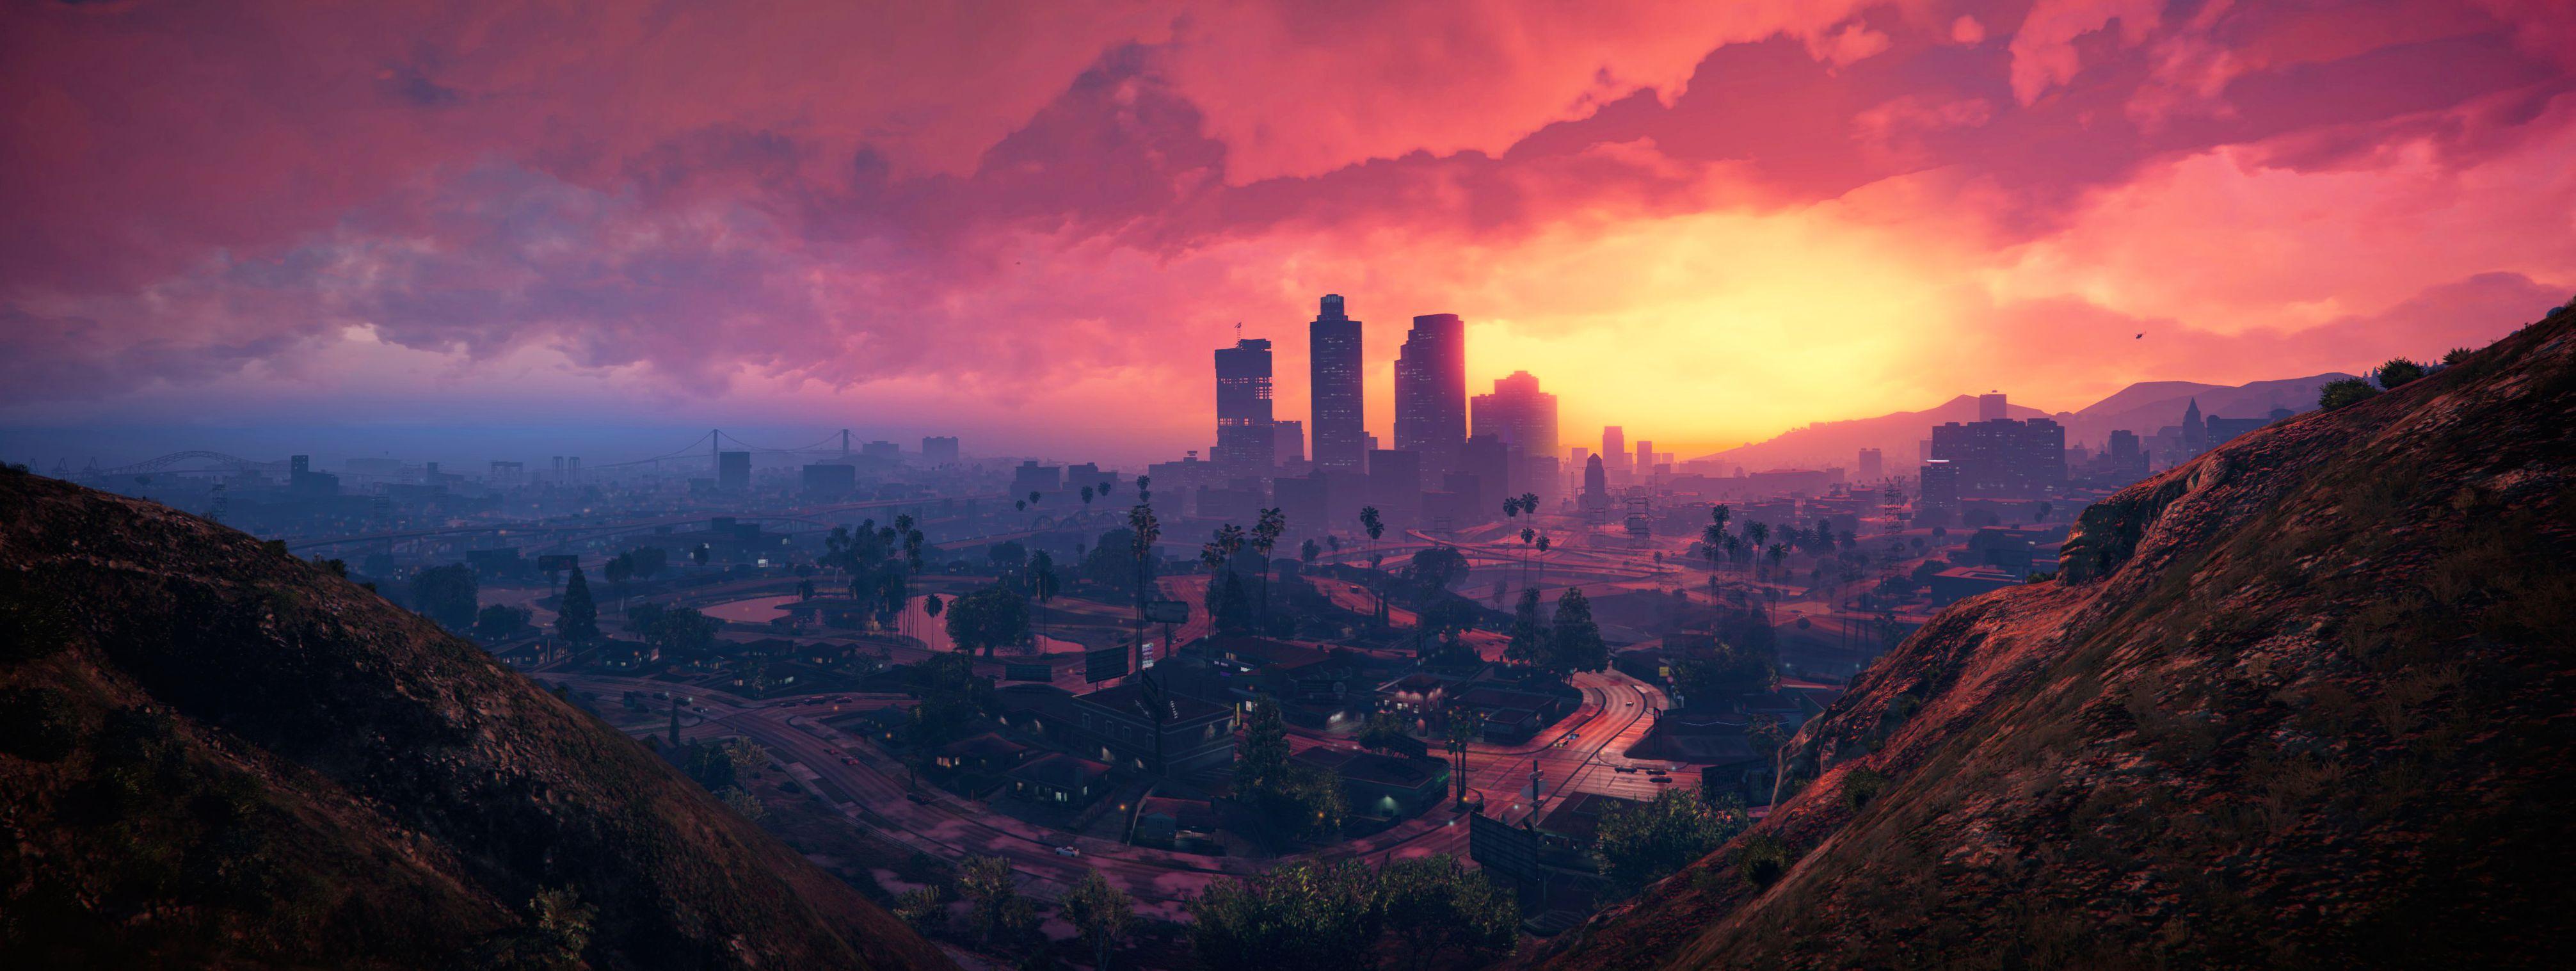 Grand Theft Auto V Hd Desktop Wallpaper High Definition - Gta V ... | 1517x4025